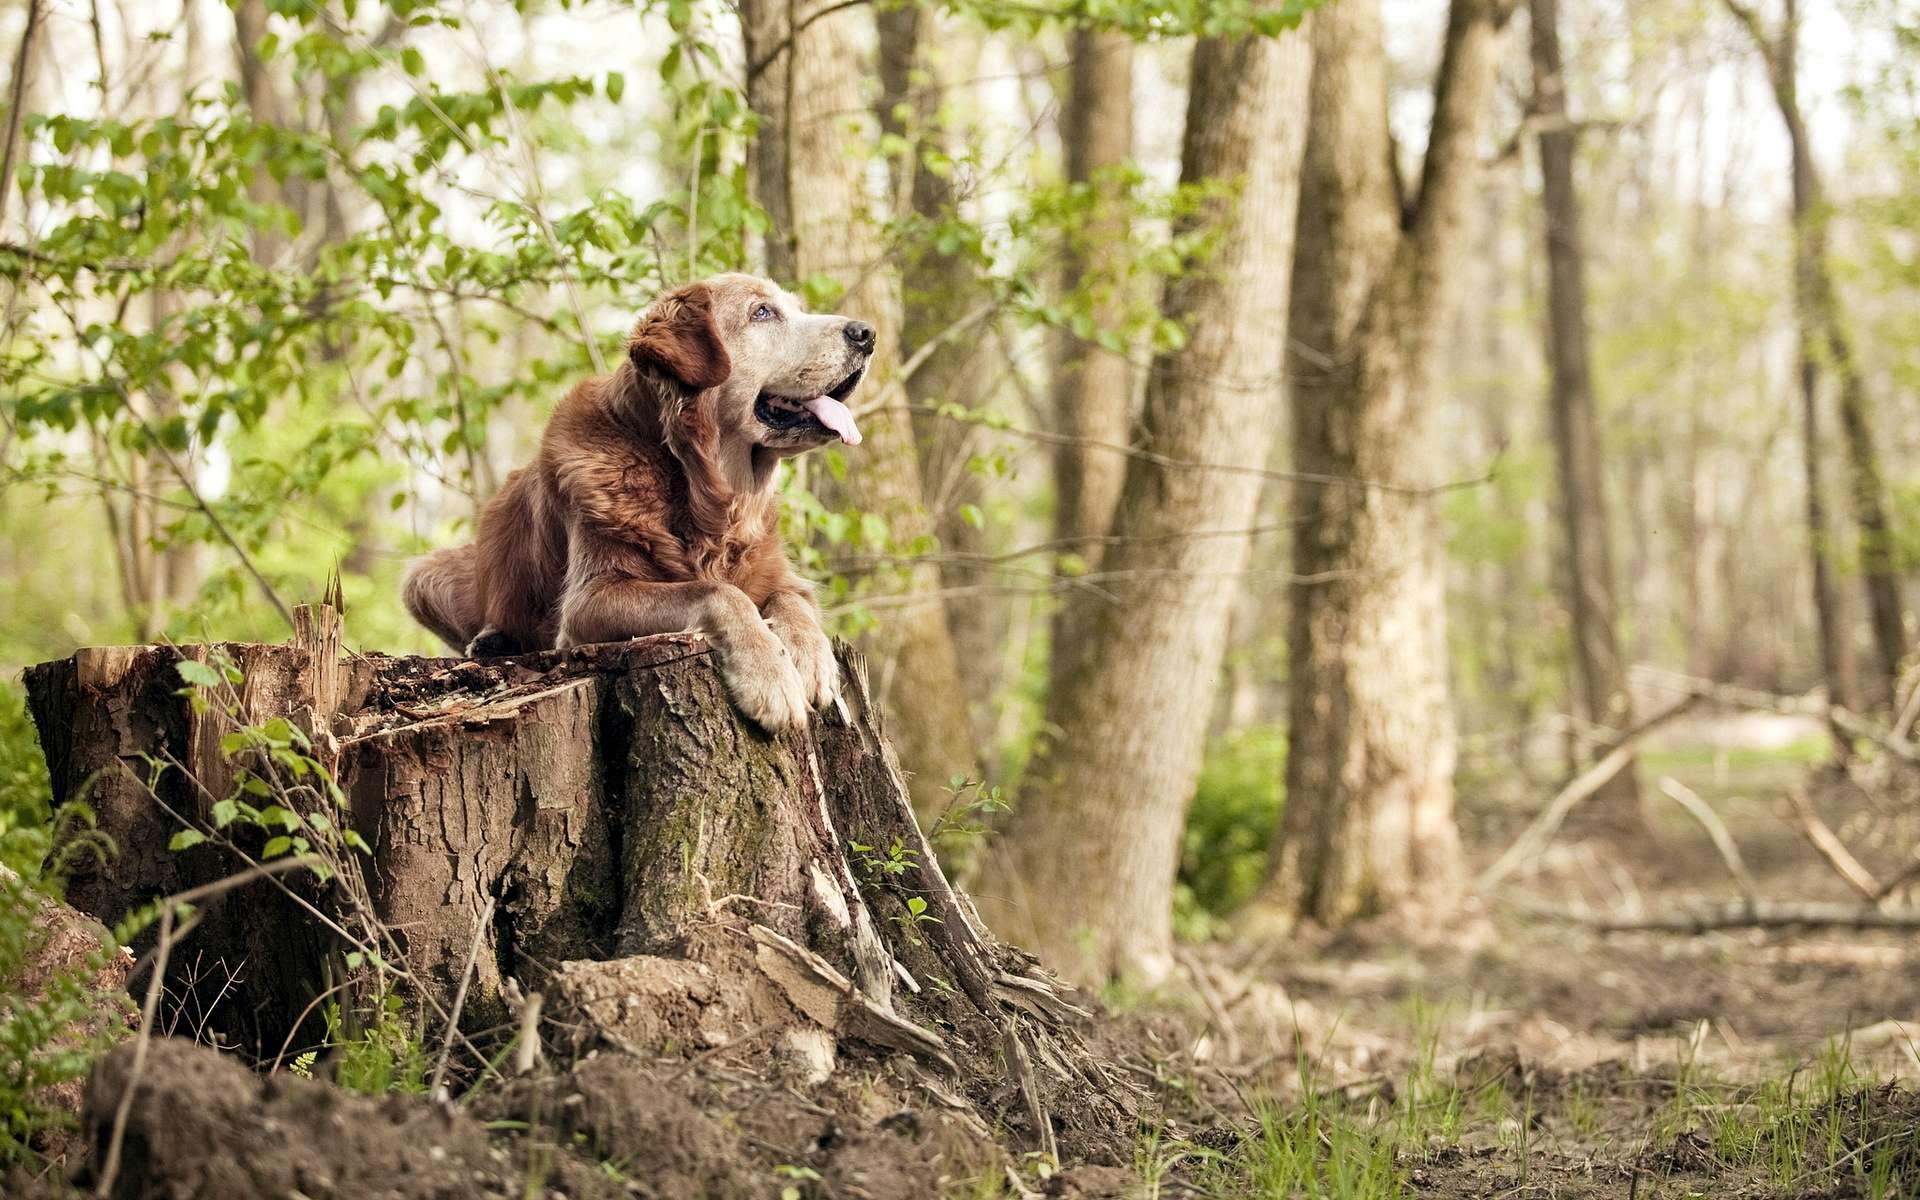 собака животное природа  № 690808 бесплатно